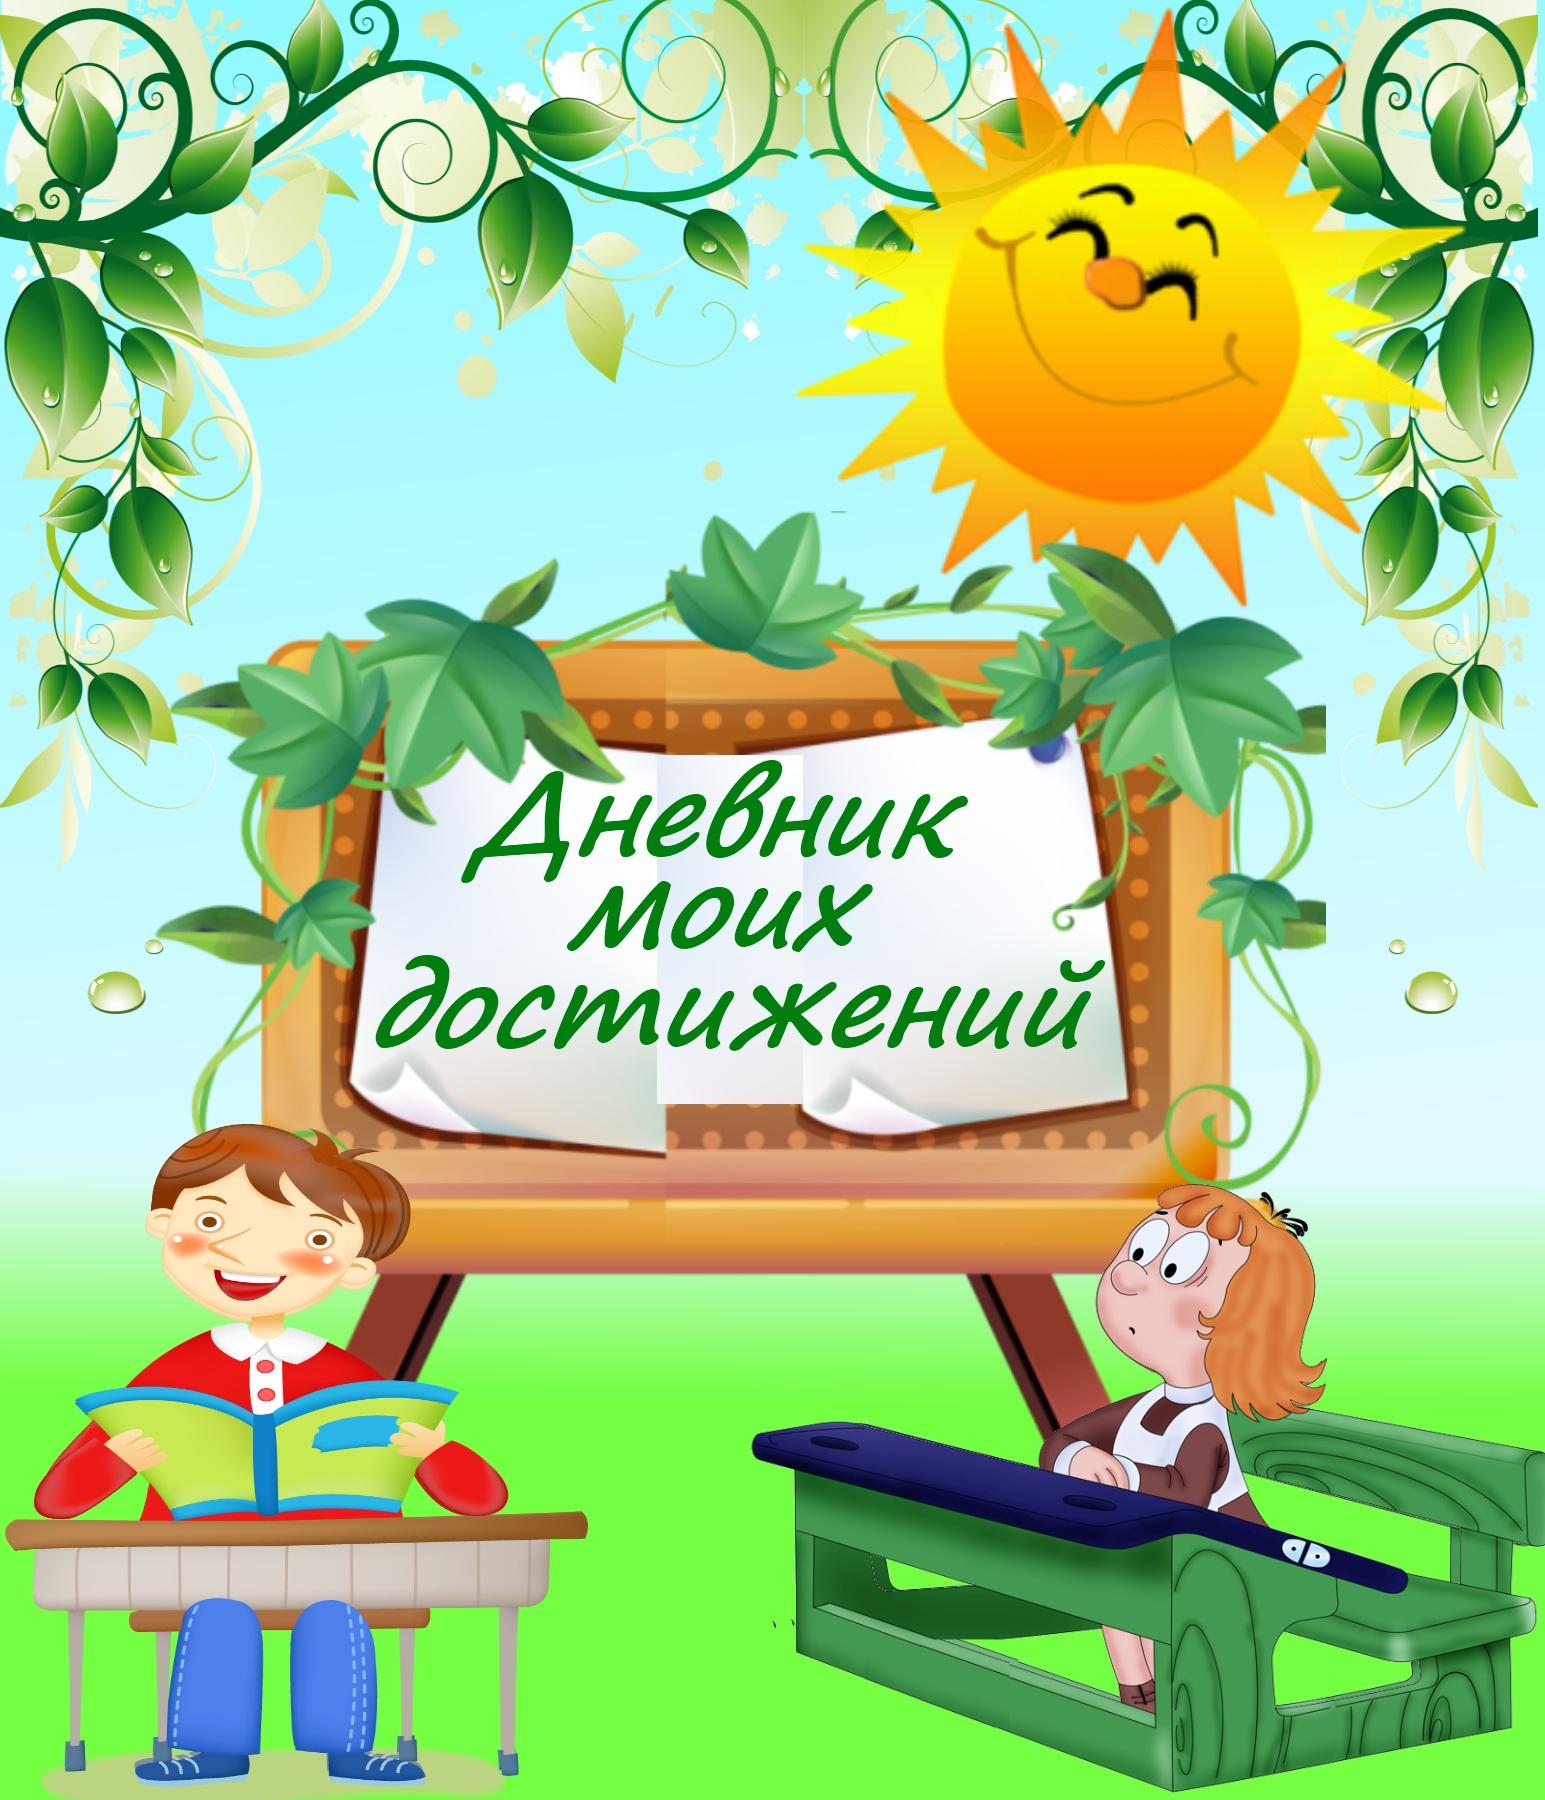 C:\Documents and Settings\Admin\Мои документы\Мои рисунки\Портфолио\Портфолио ученика\moi_dnevnik_dostizhenii.jpg